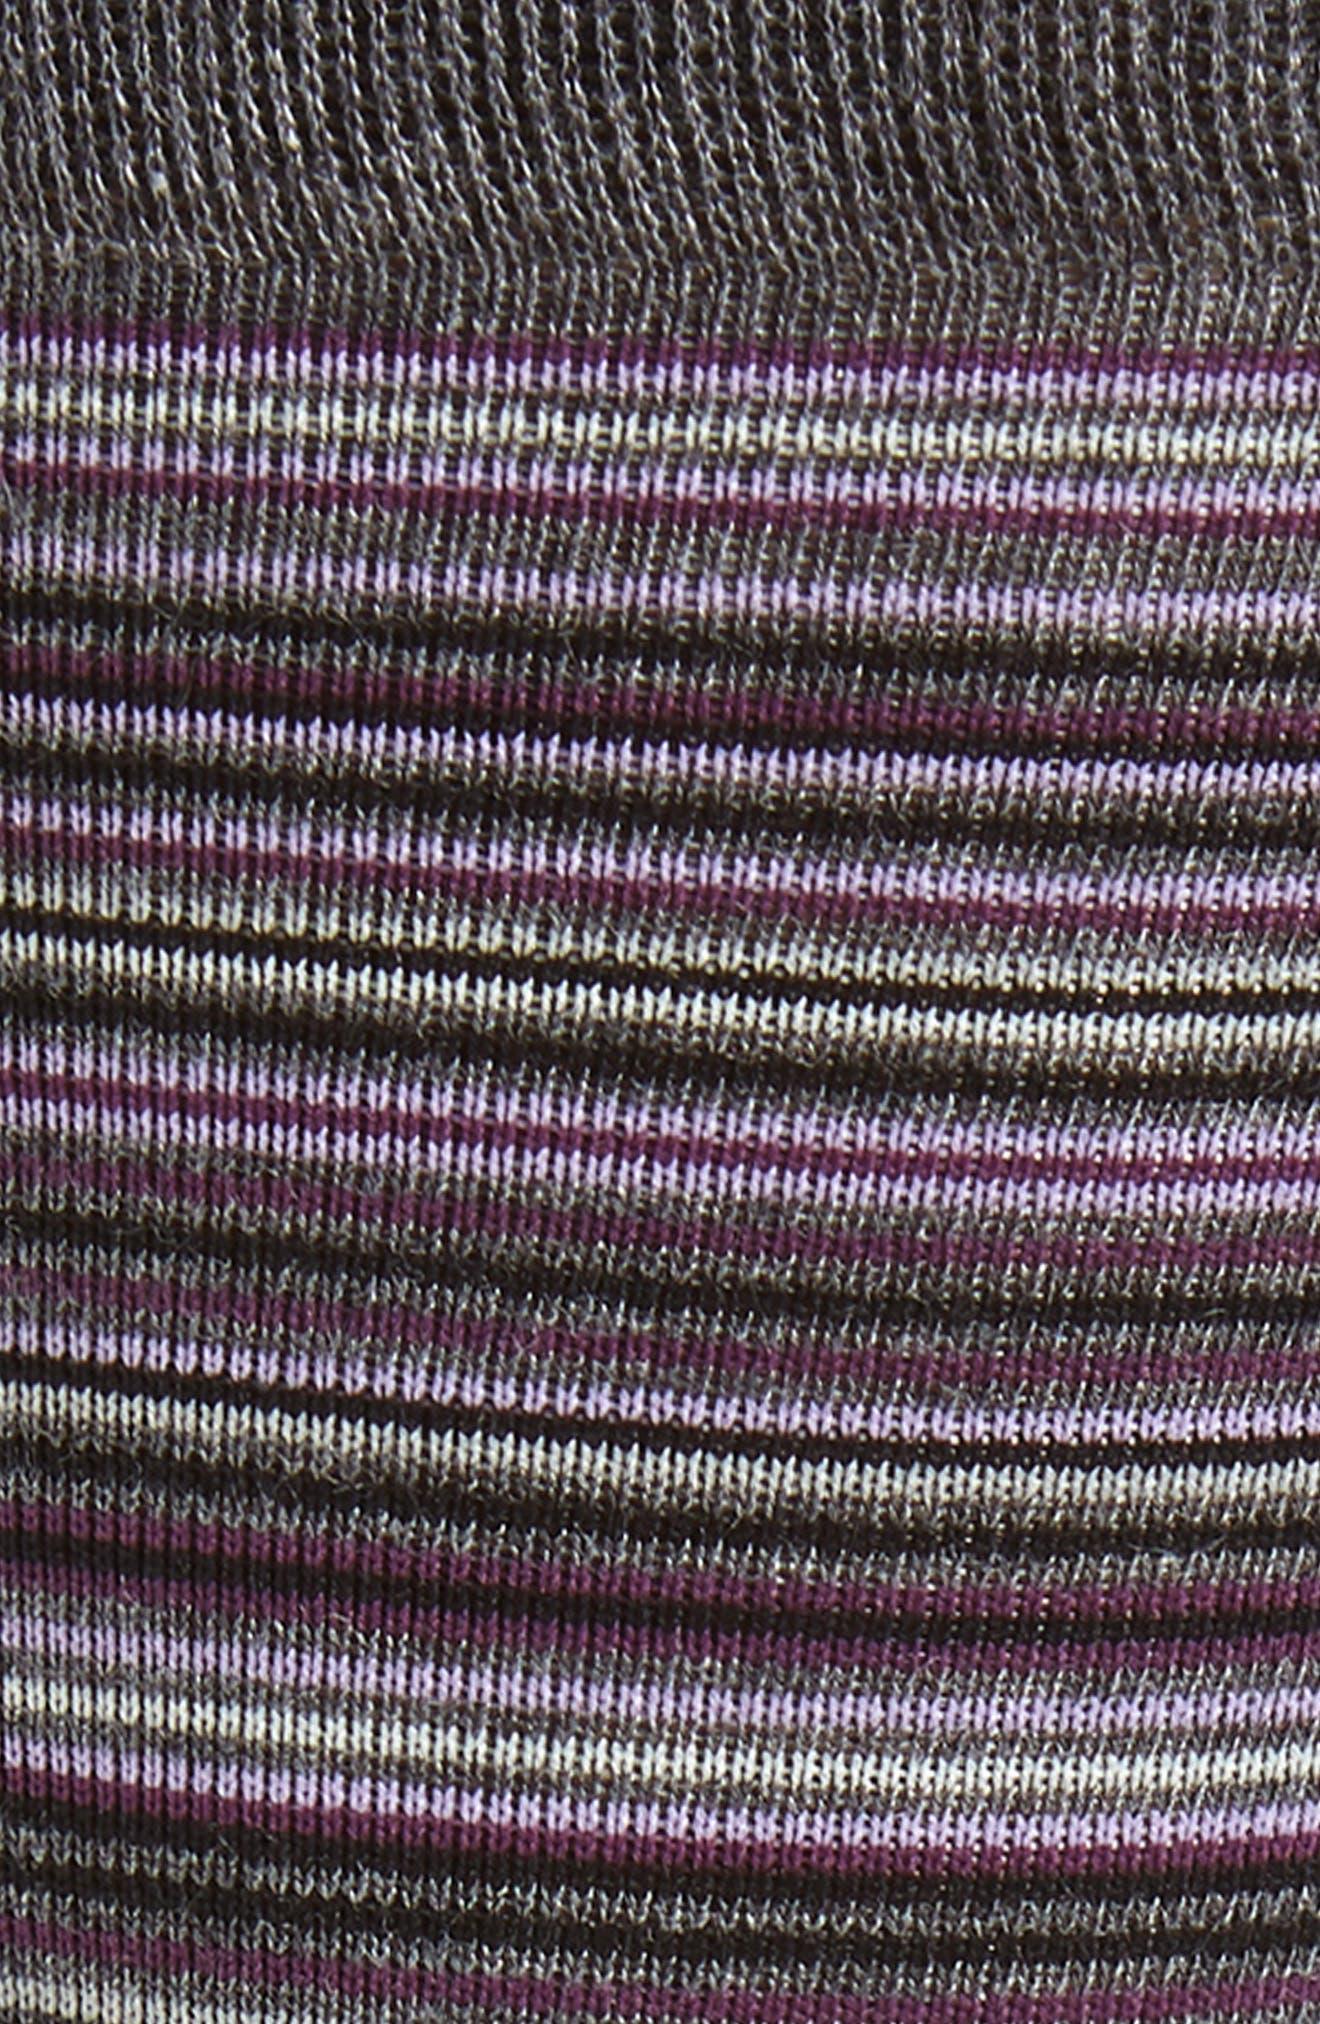 Multistripe Crew Socks,                             Alternate thumbnail 2, color,                             CHARCOAL HEATHER/ PURPLE